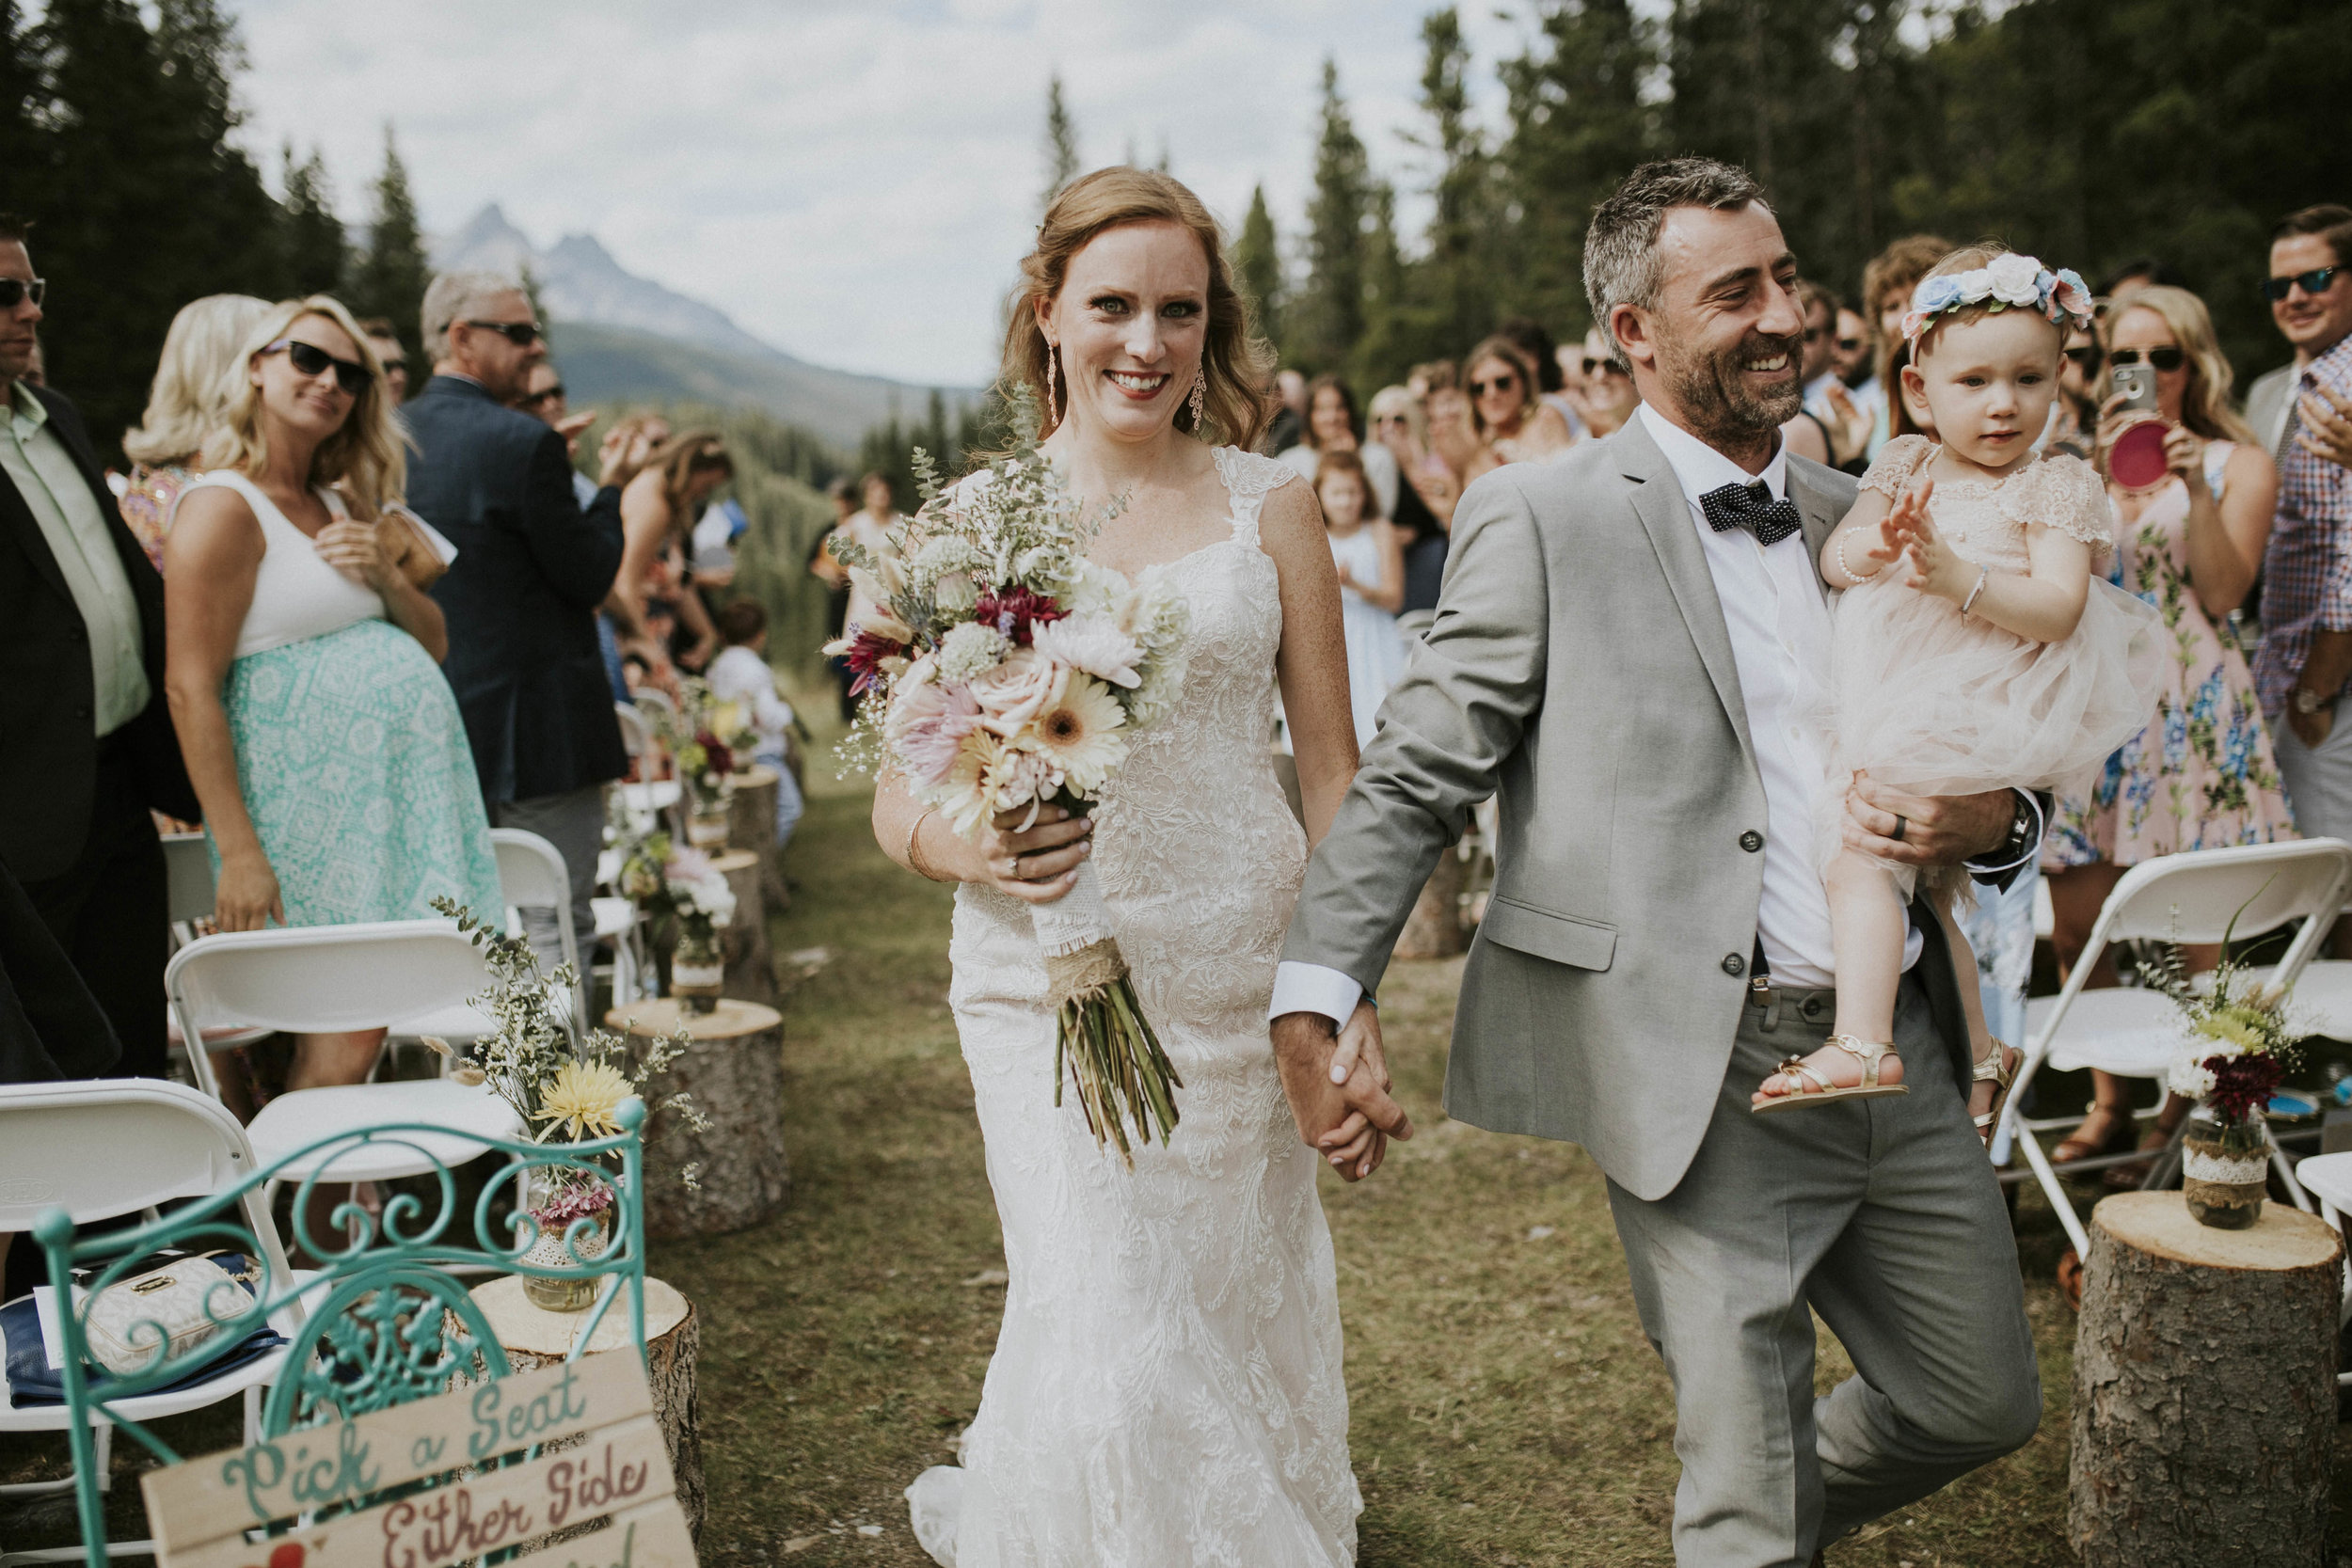 married couple walks down isle mt norquay weddding banff